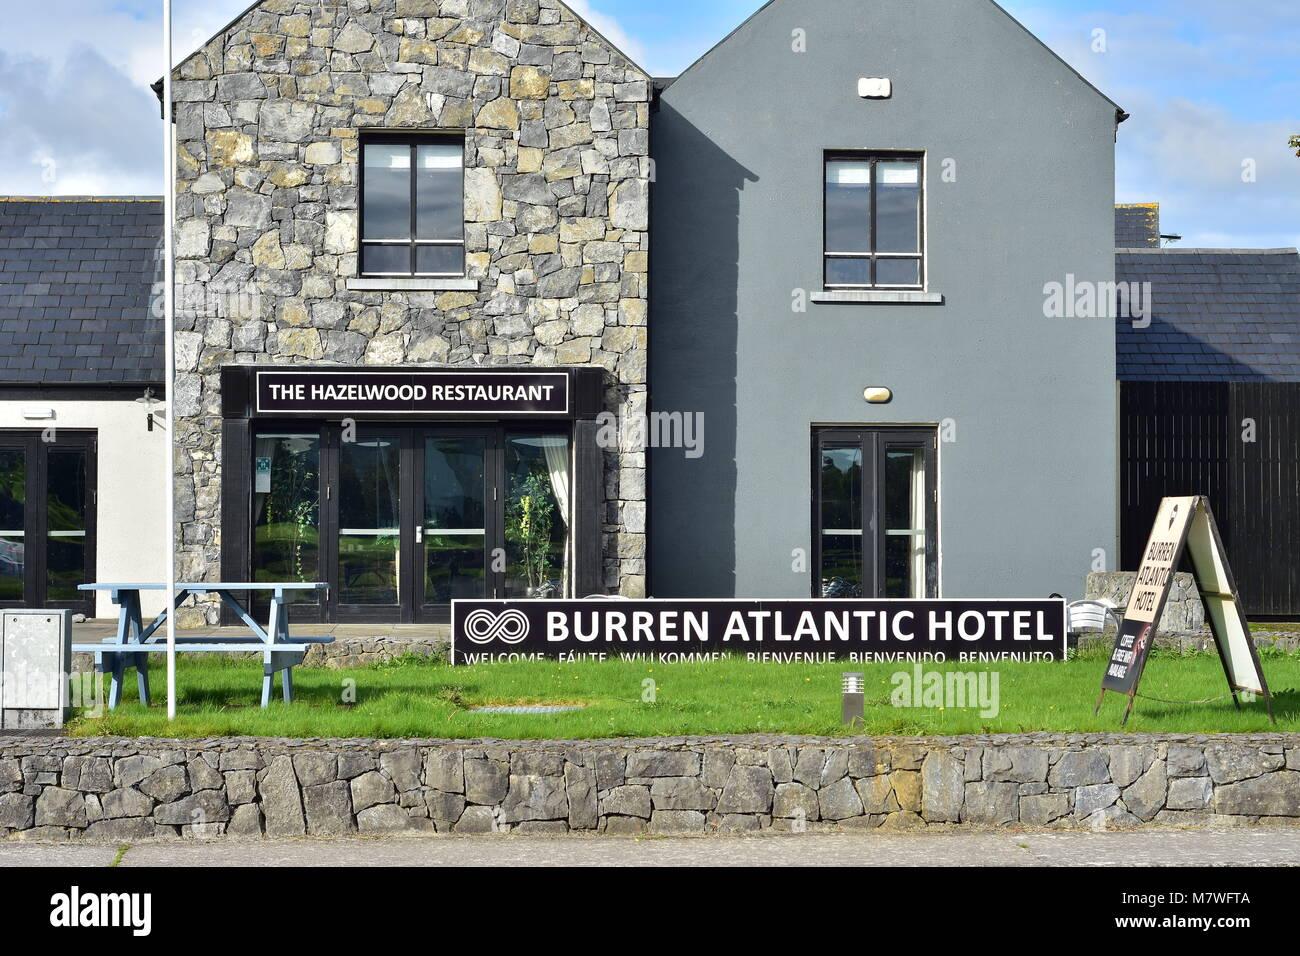 Small Burren Atlantic Hotel with restaurant in village of Ballyvaughan on Atlantic coast of in western Ireland. - Stock Image